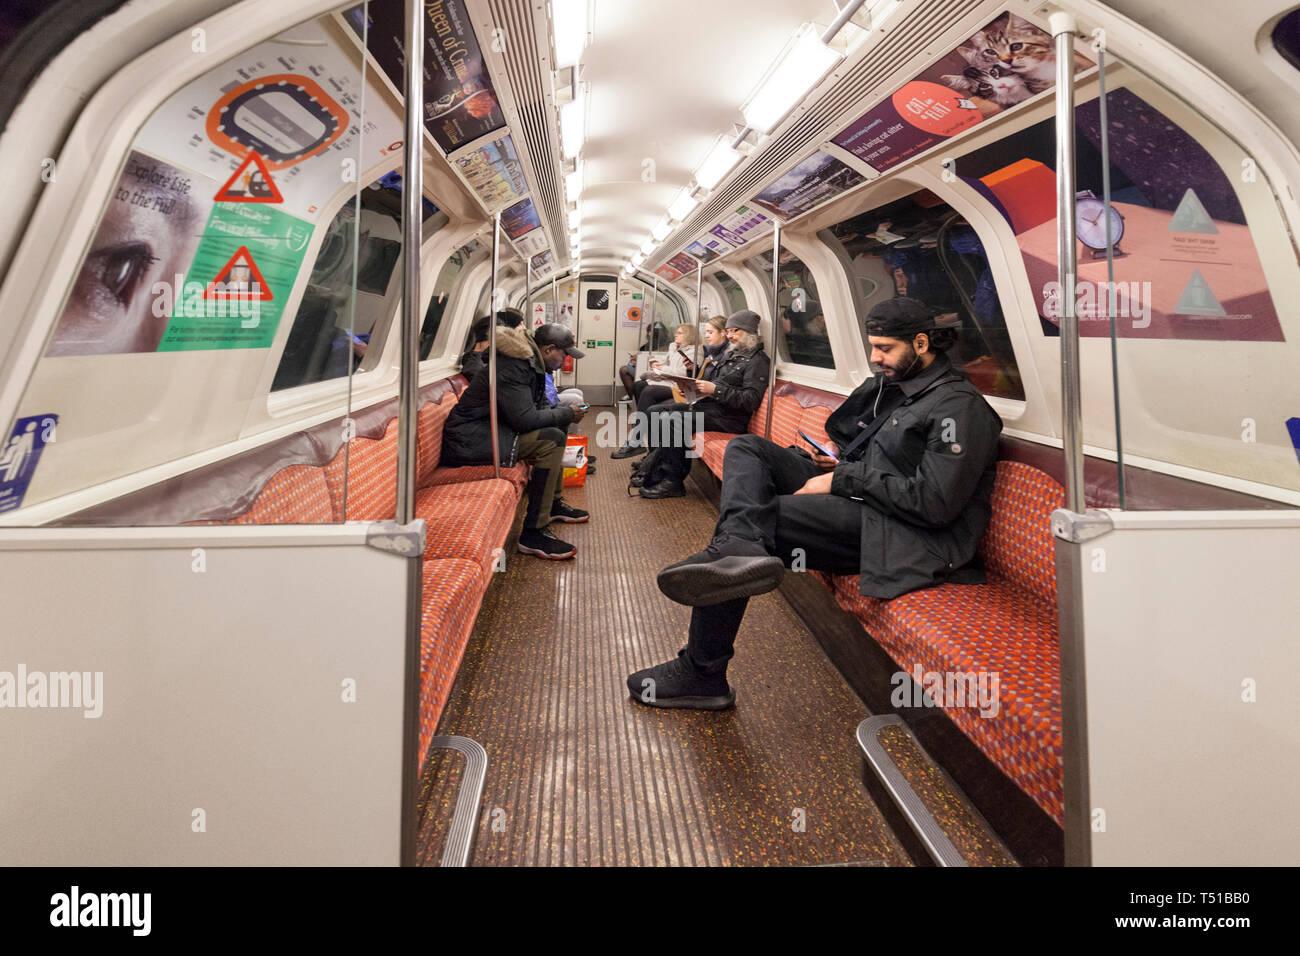 22/03/2019 Passengers on the Glasgow SPT subway - Stock Image